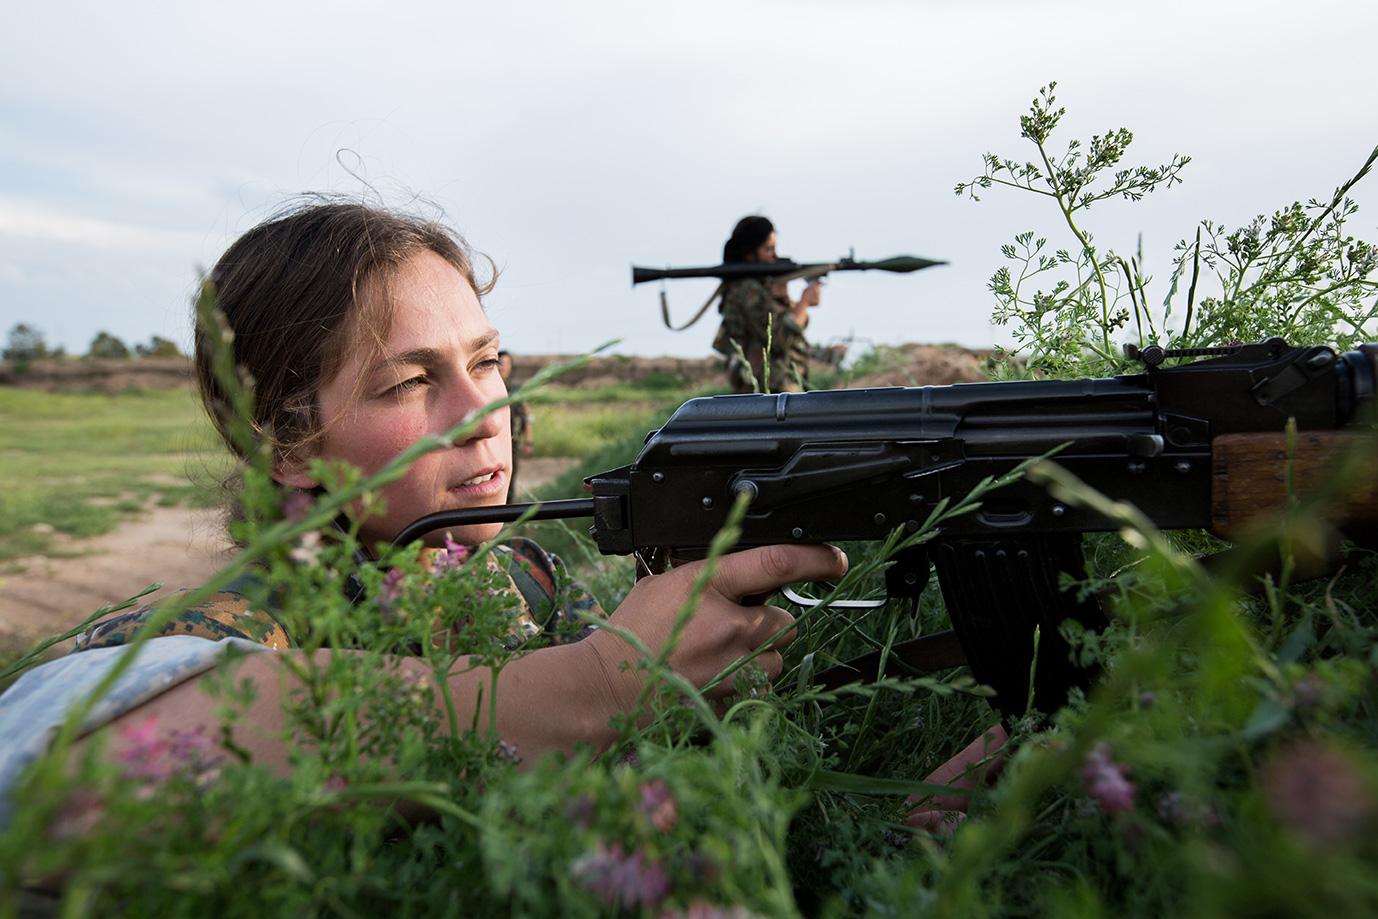 yesidi female unit shooting isis sinjar iraq